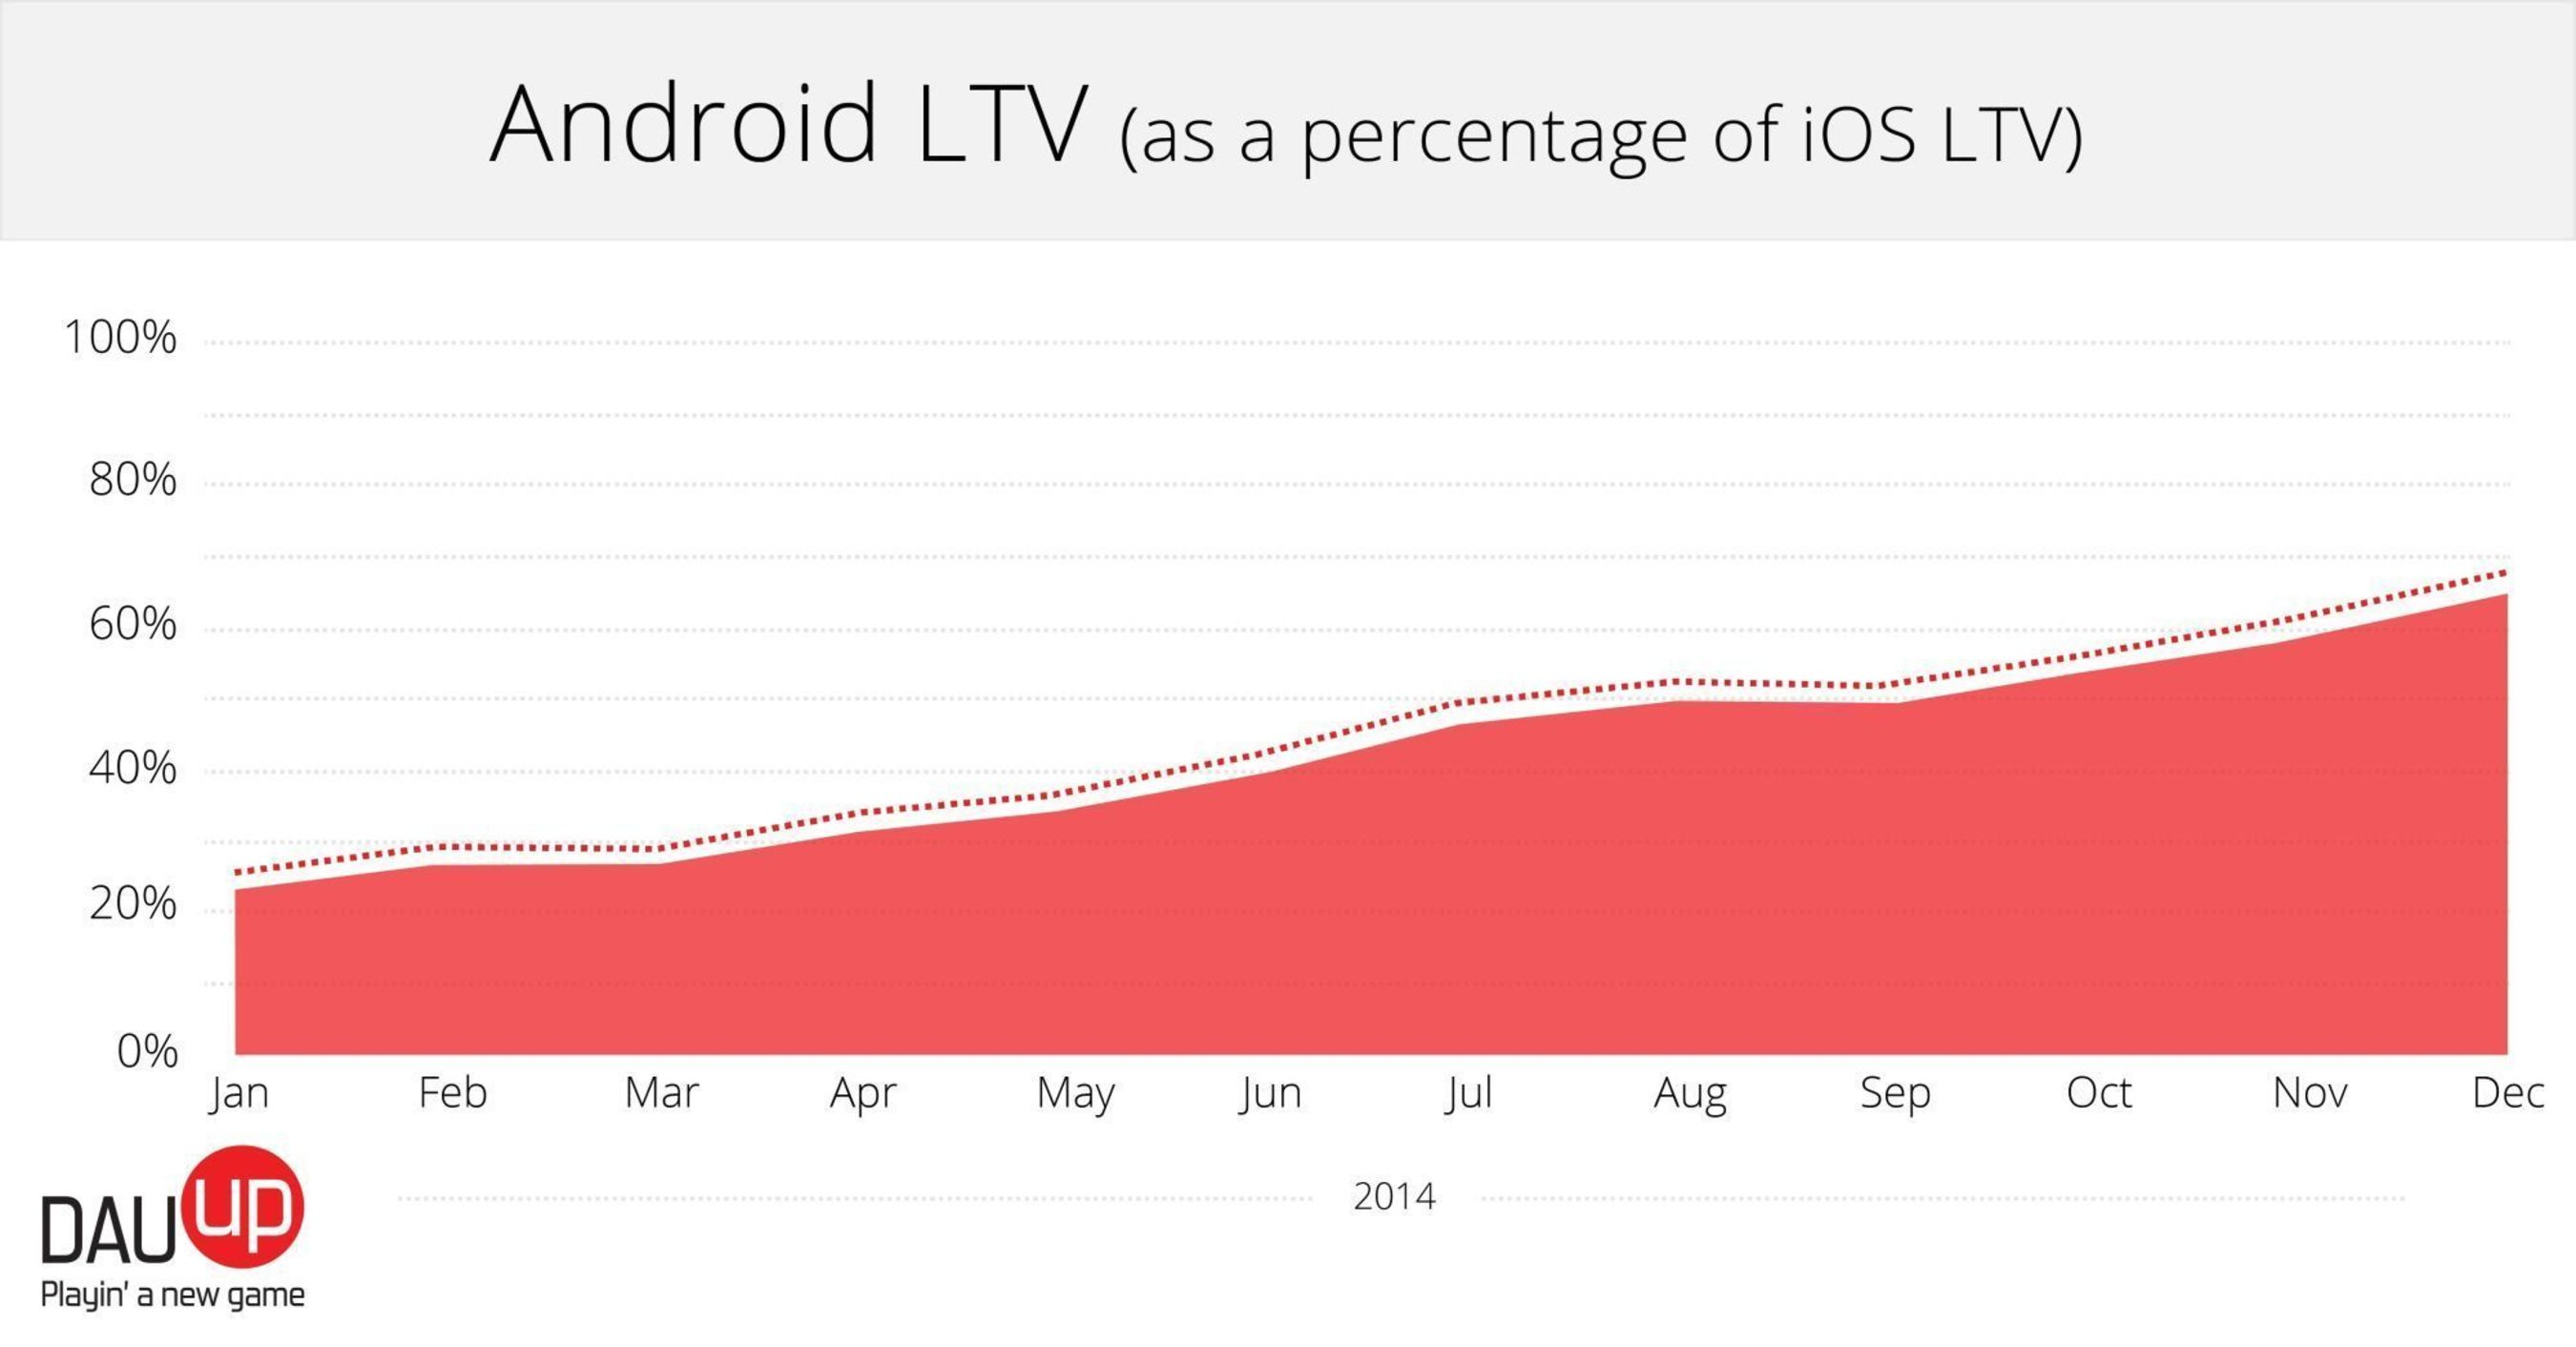 Android Lifetime Value as a percentage of iOS Lifetime Value (PRNewsFoto/DAU-UP)